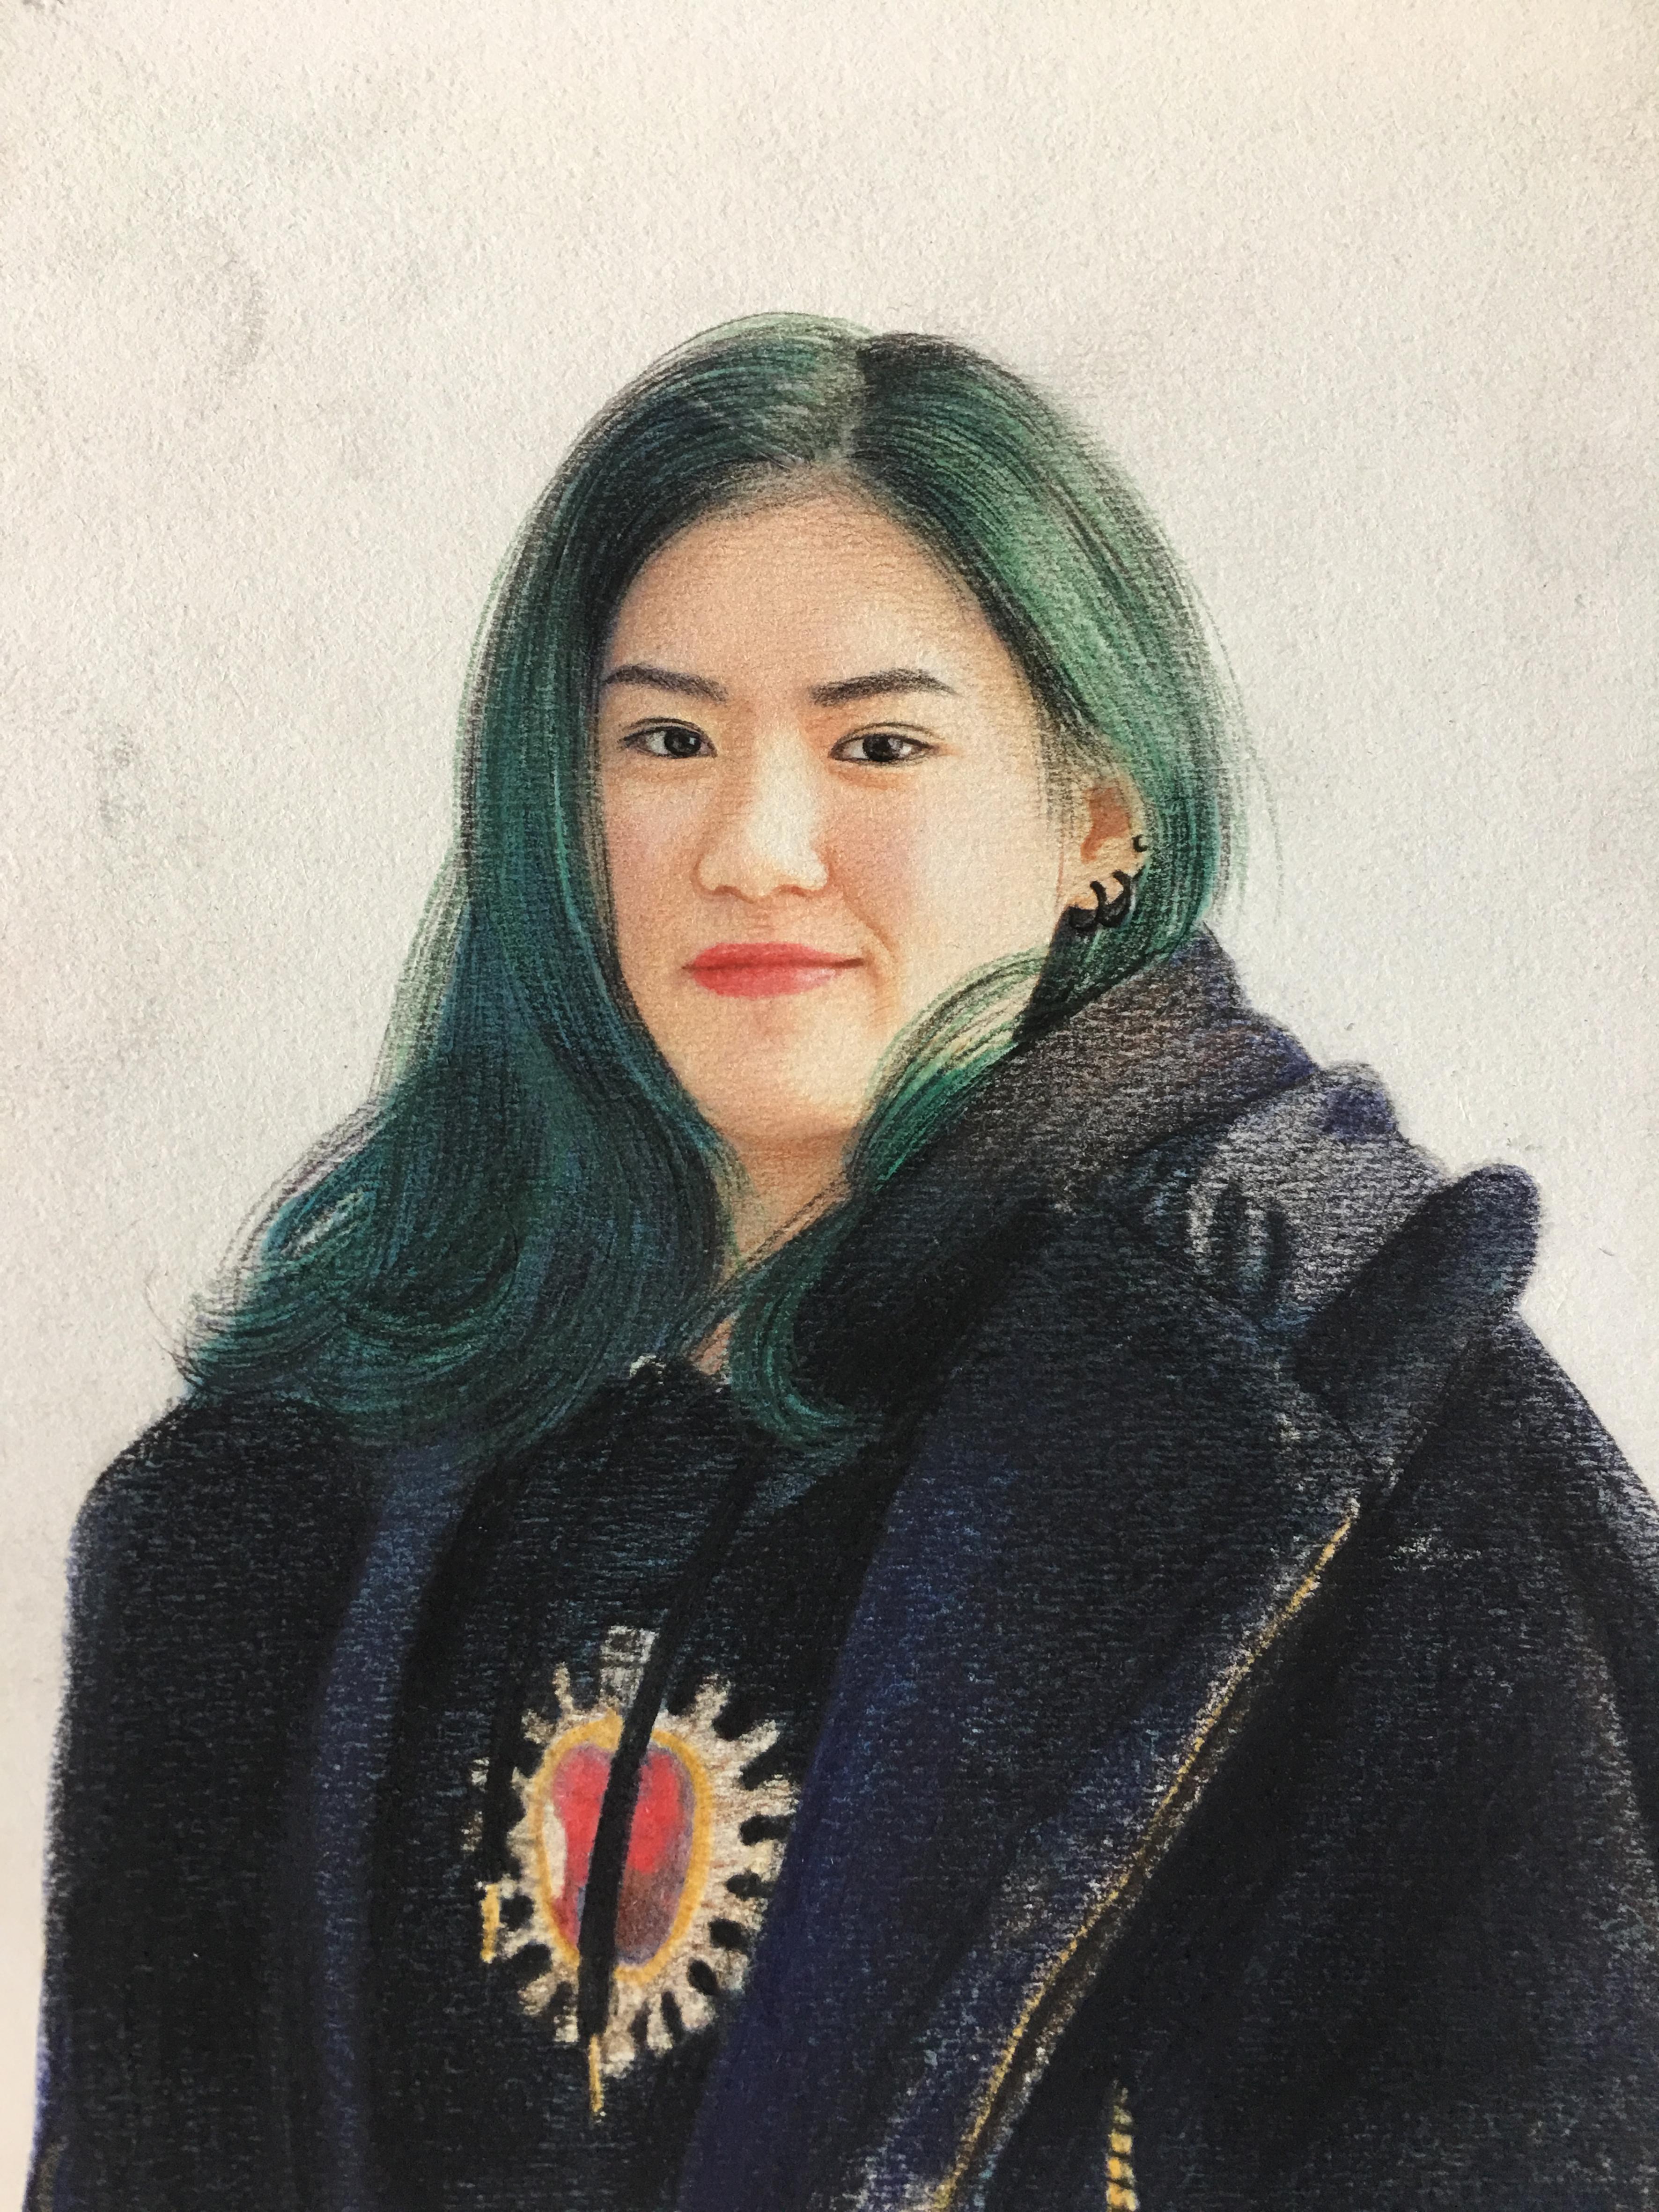 Gabrielle Tsoi